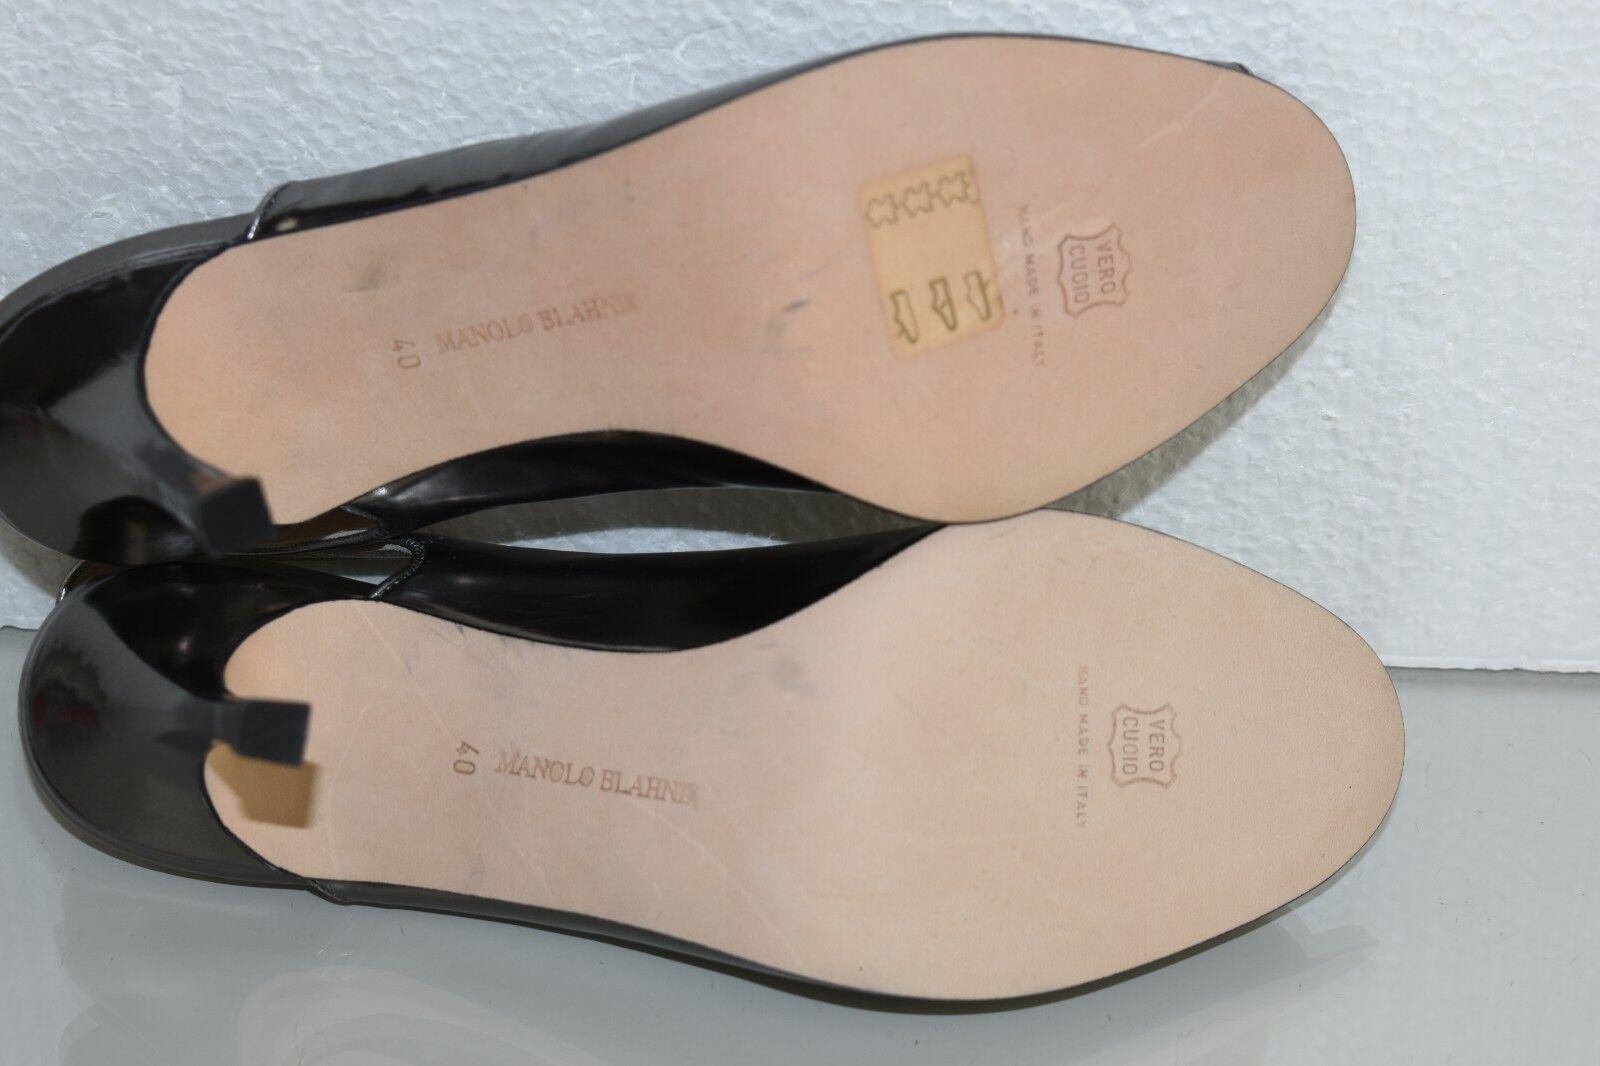 NEW Manolo Blahnik Blahnik Blahnik Peep Toe Leather Slingback Silver Liq Metallic Grey shoes 40 84f40f